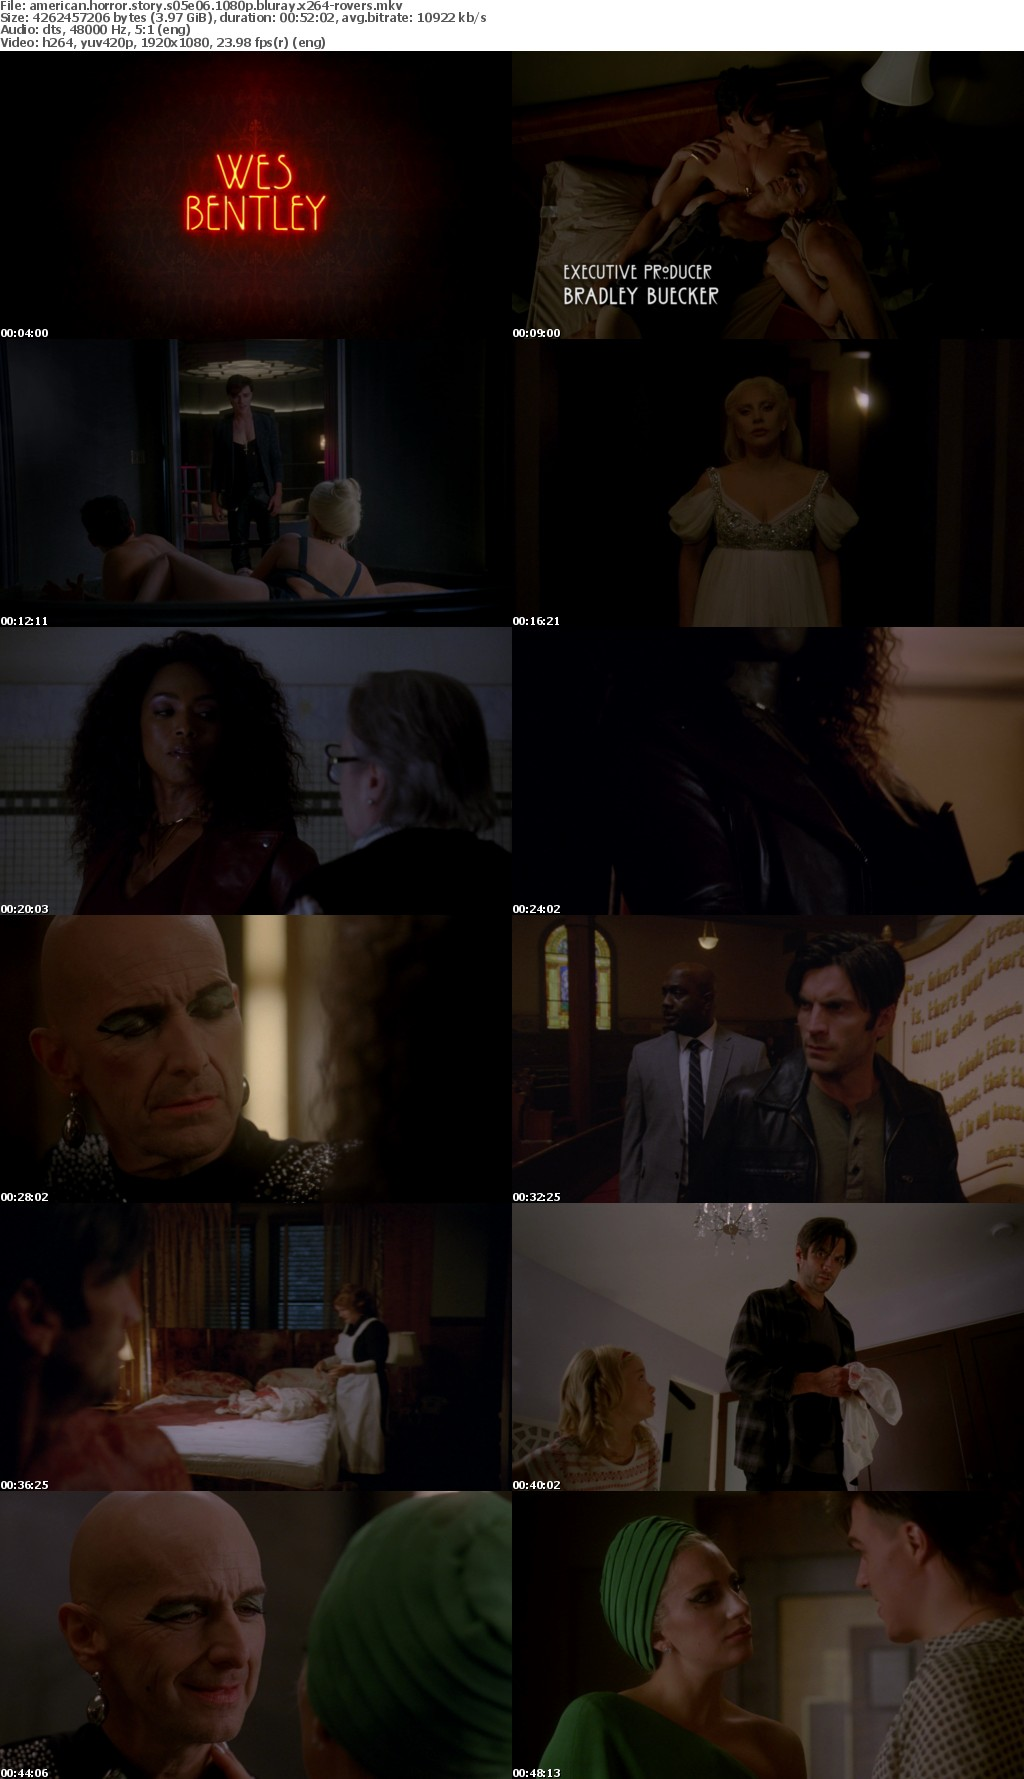 American Horror Story S05 1080p BluRay x264